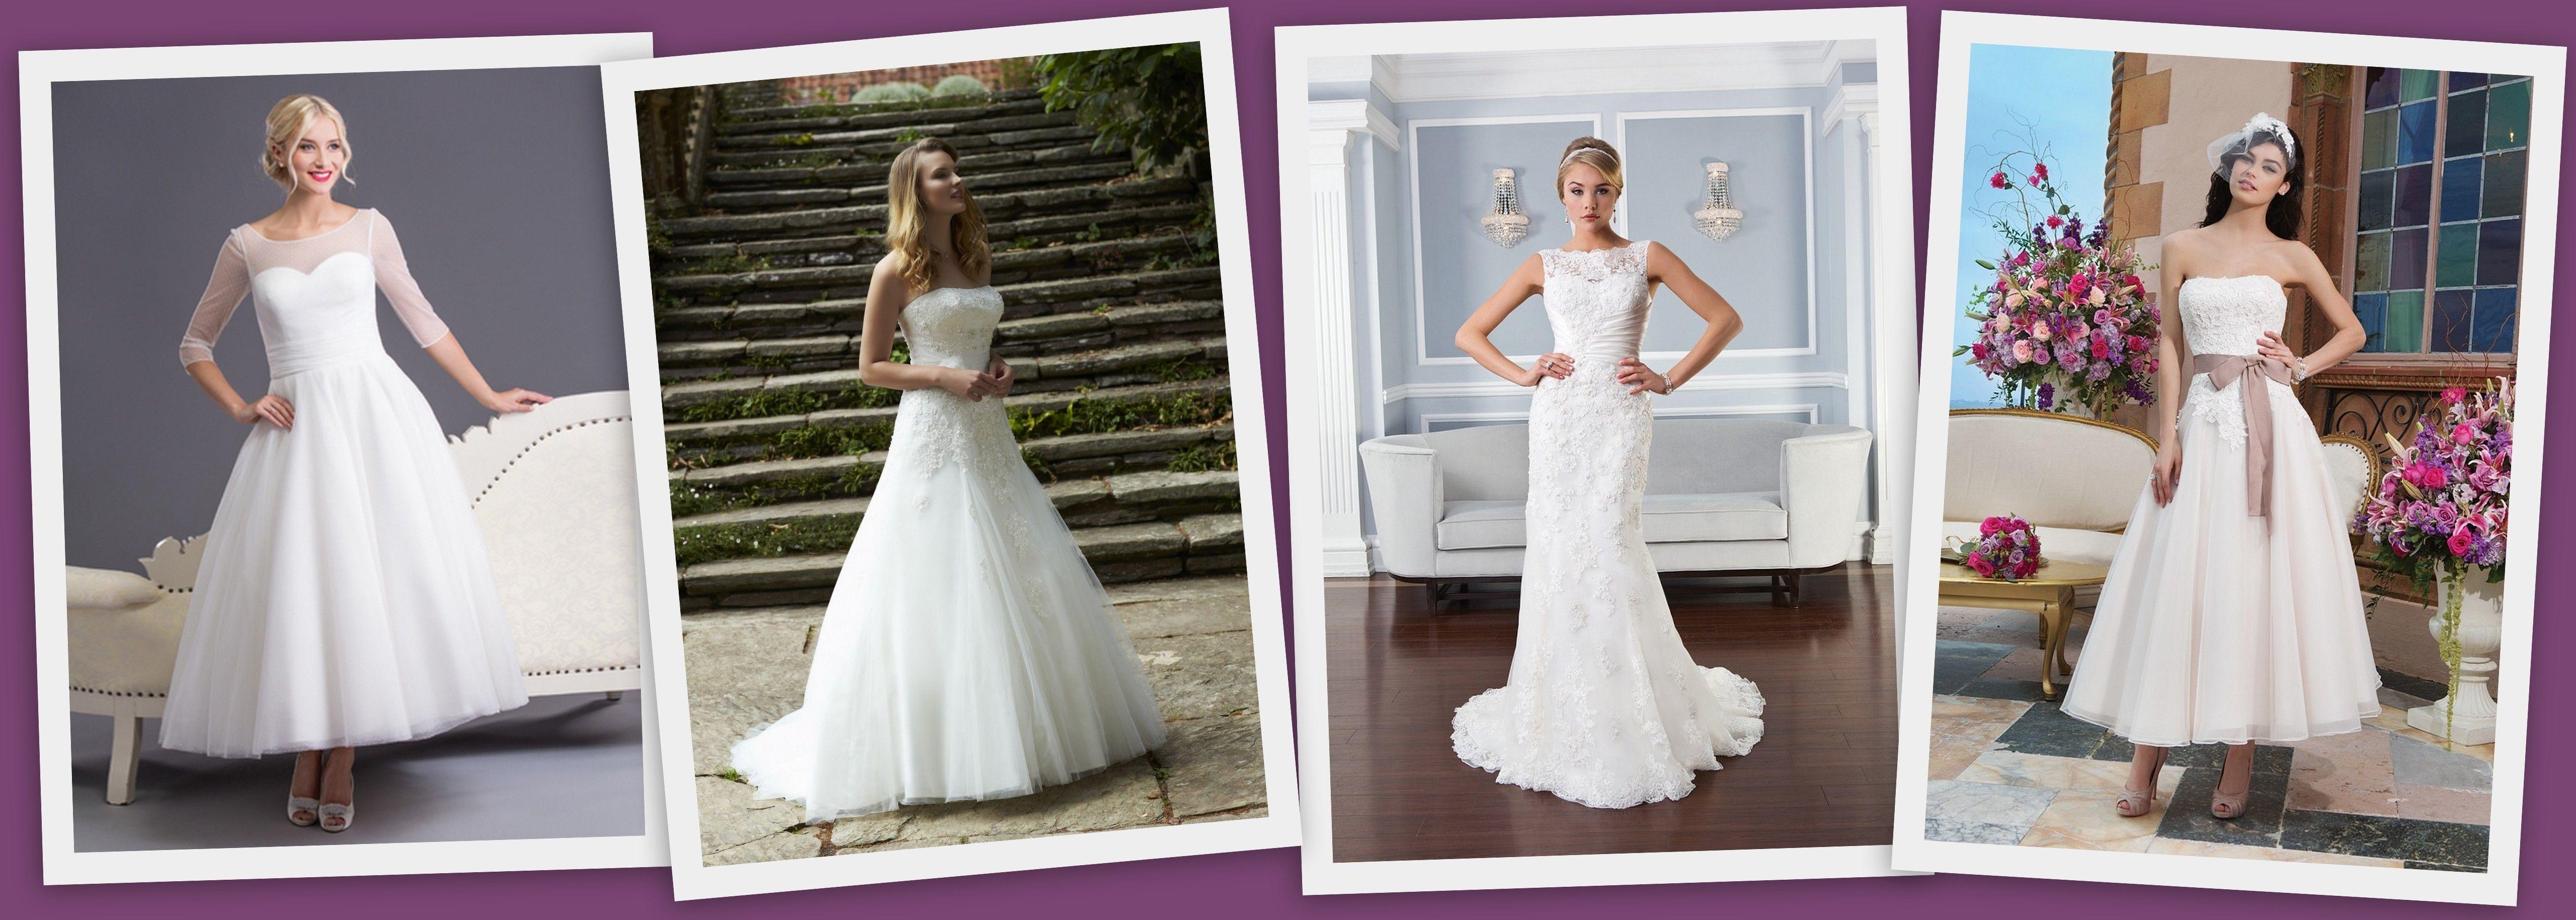 Wedding Dresses In Swansea